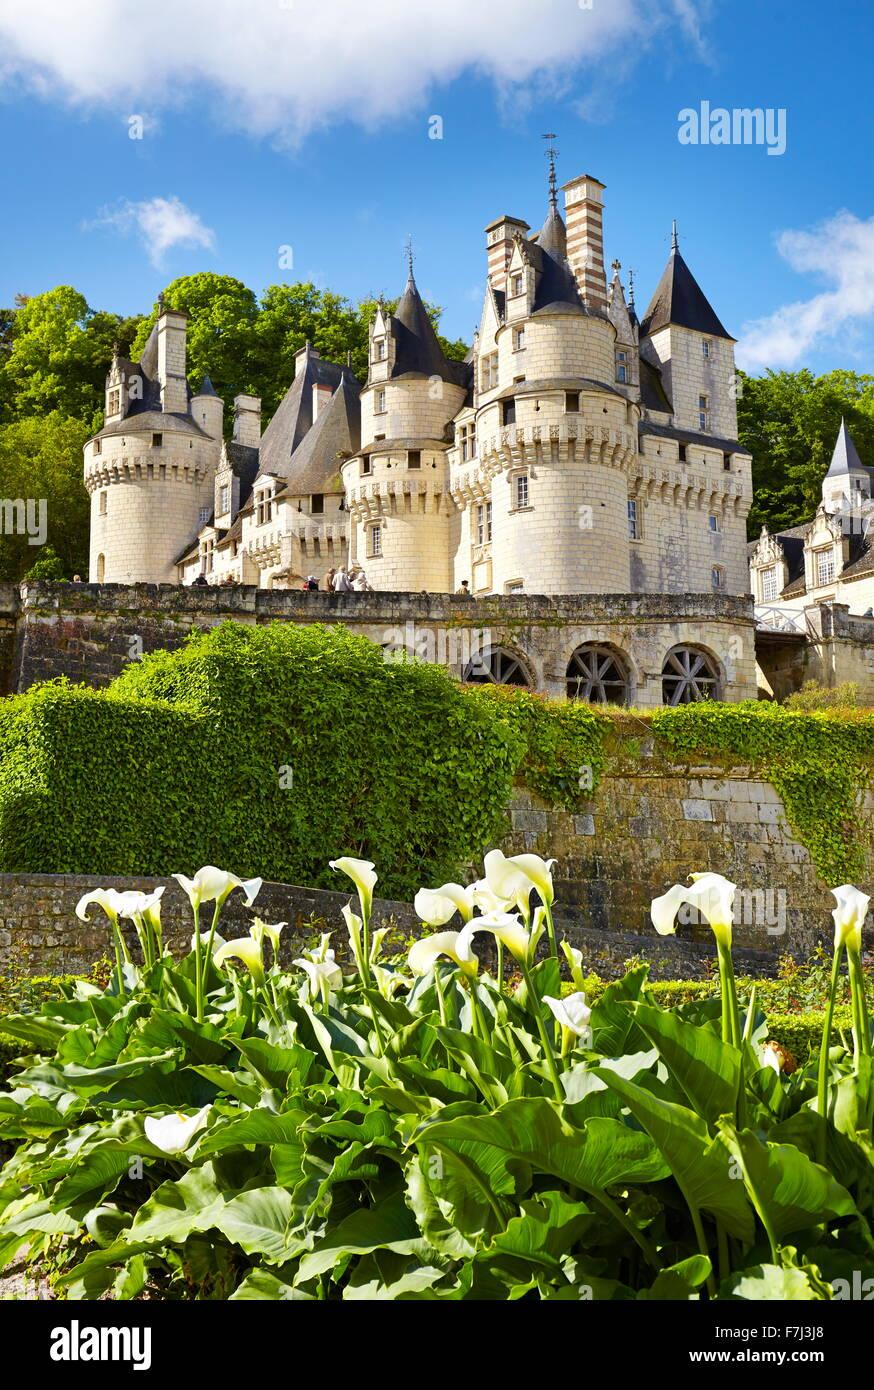 Castillo de Usse Usse, Valle del Loira, Francia Imagen De Stock